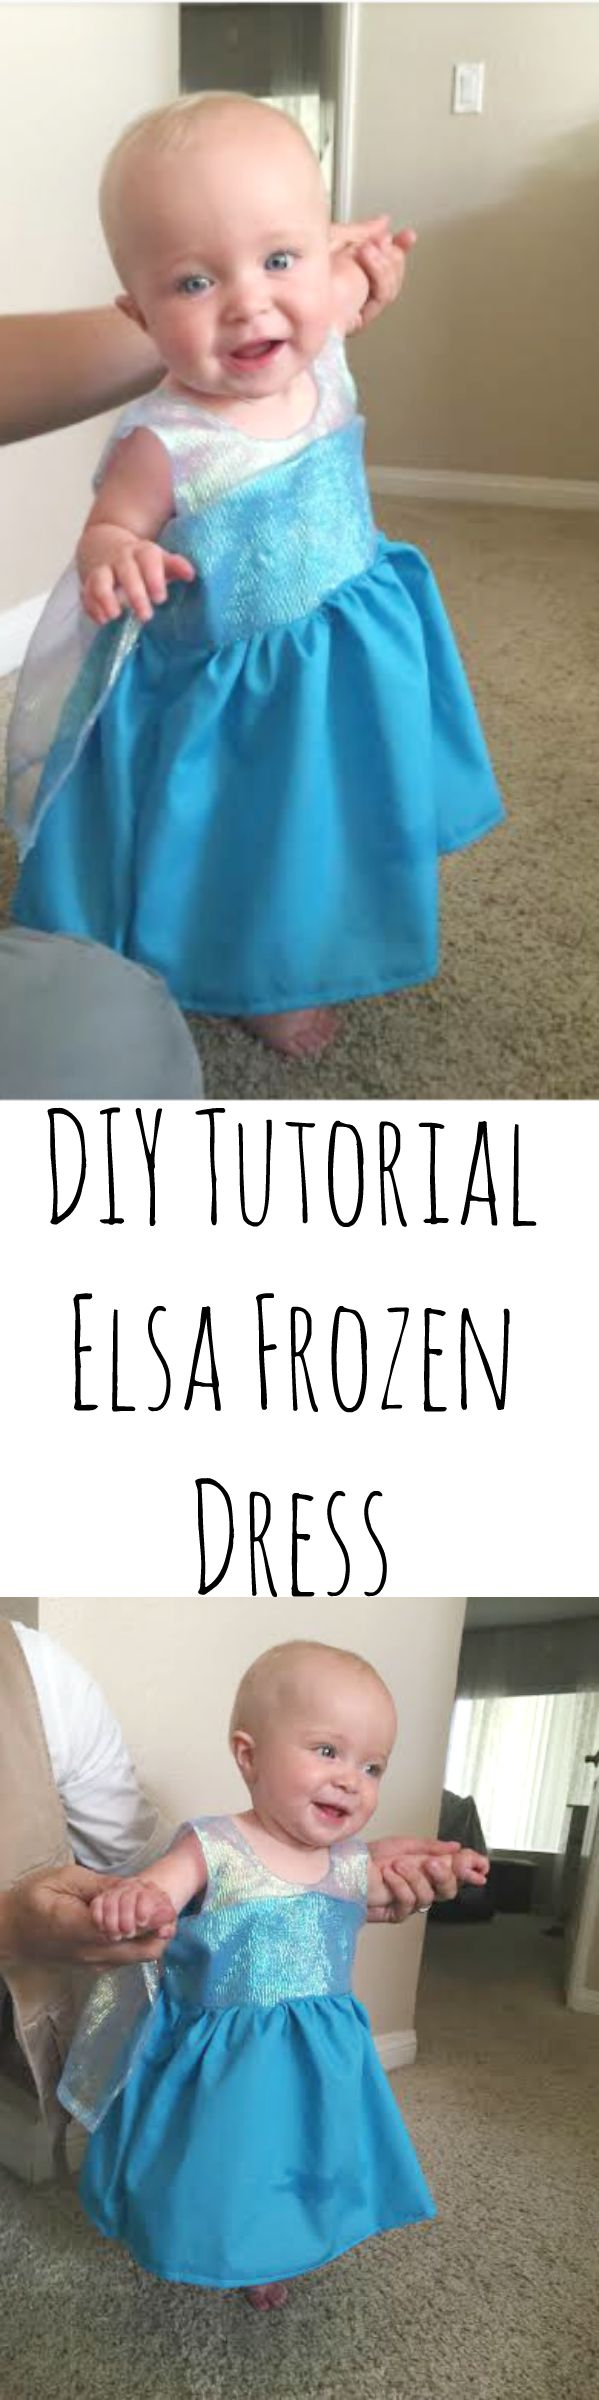 DIY Tutorial - Elsa Frozen Dress